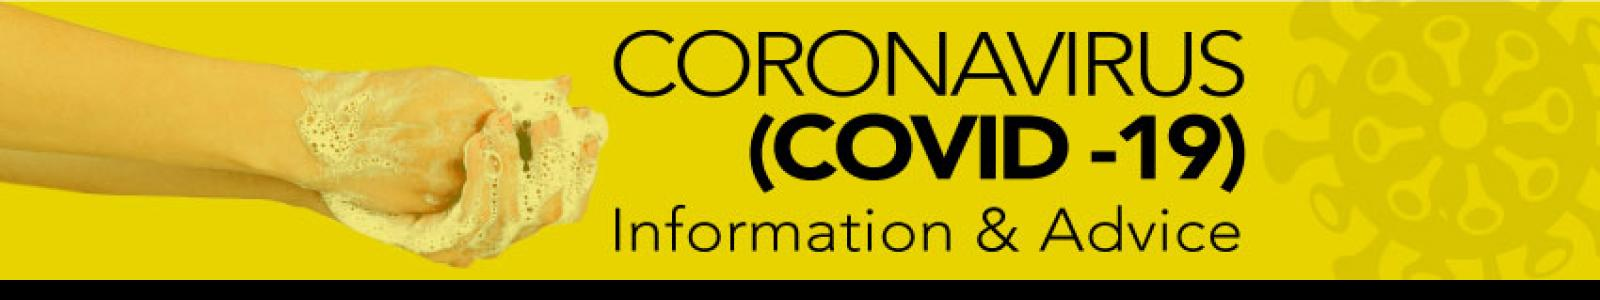 Coronavirus Covid 19 Information & Advice